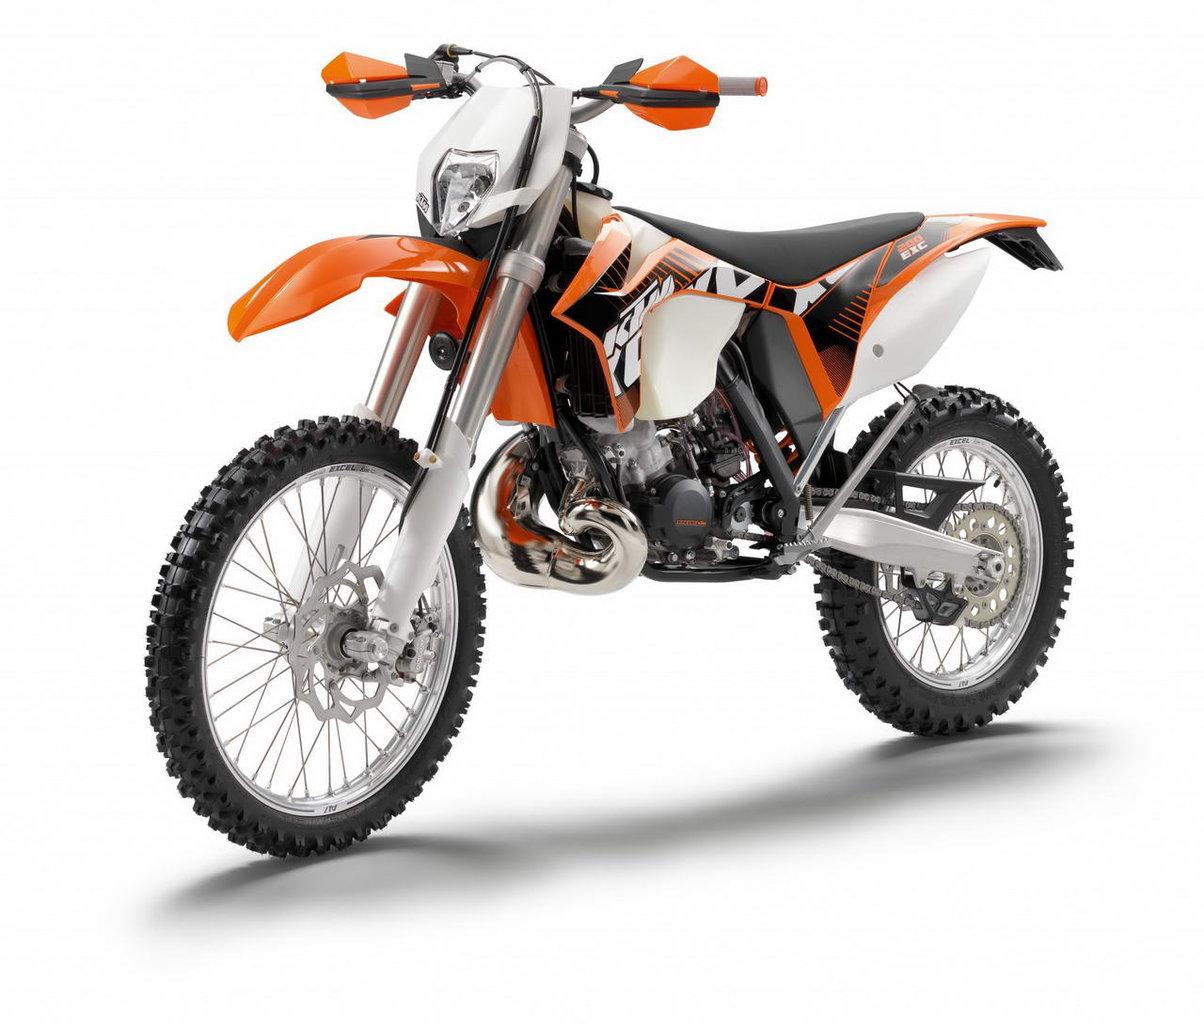 Listino Ktm EXC-F 250 SIX DAYS Fuoristrada - image 14812_ktm-exc-f250 on http://moto.motori.net